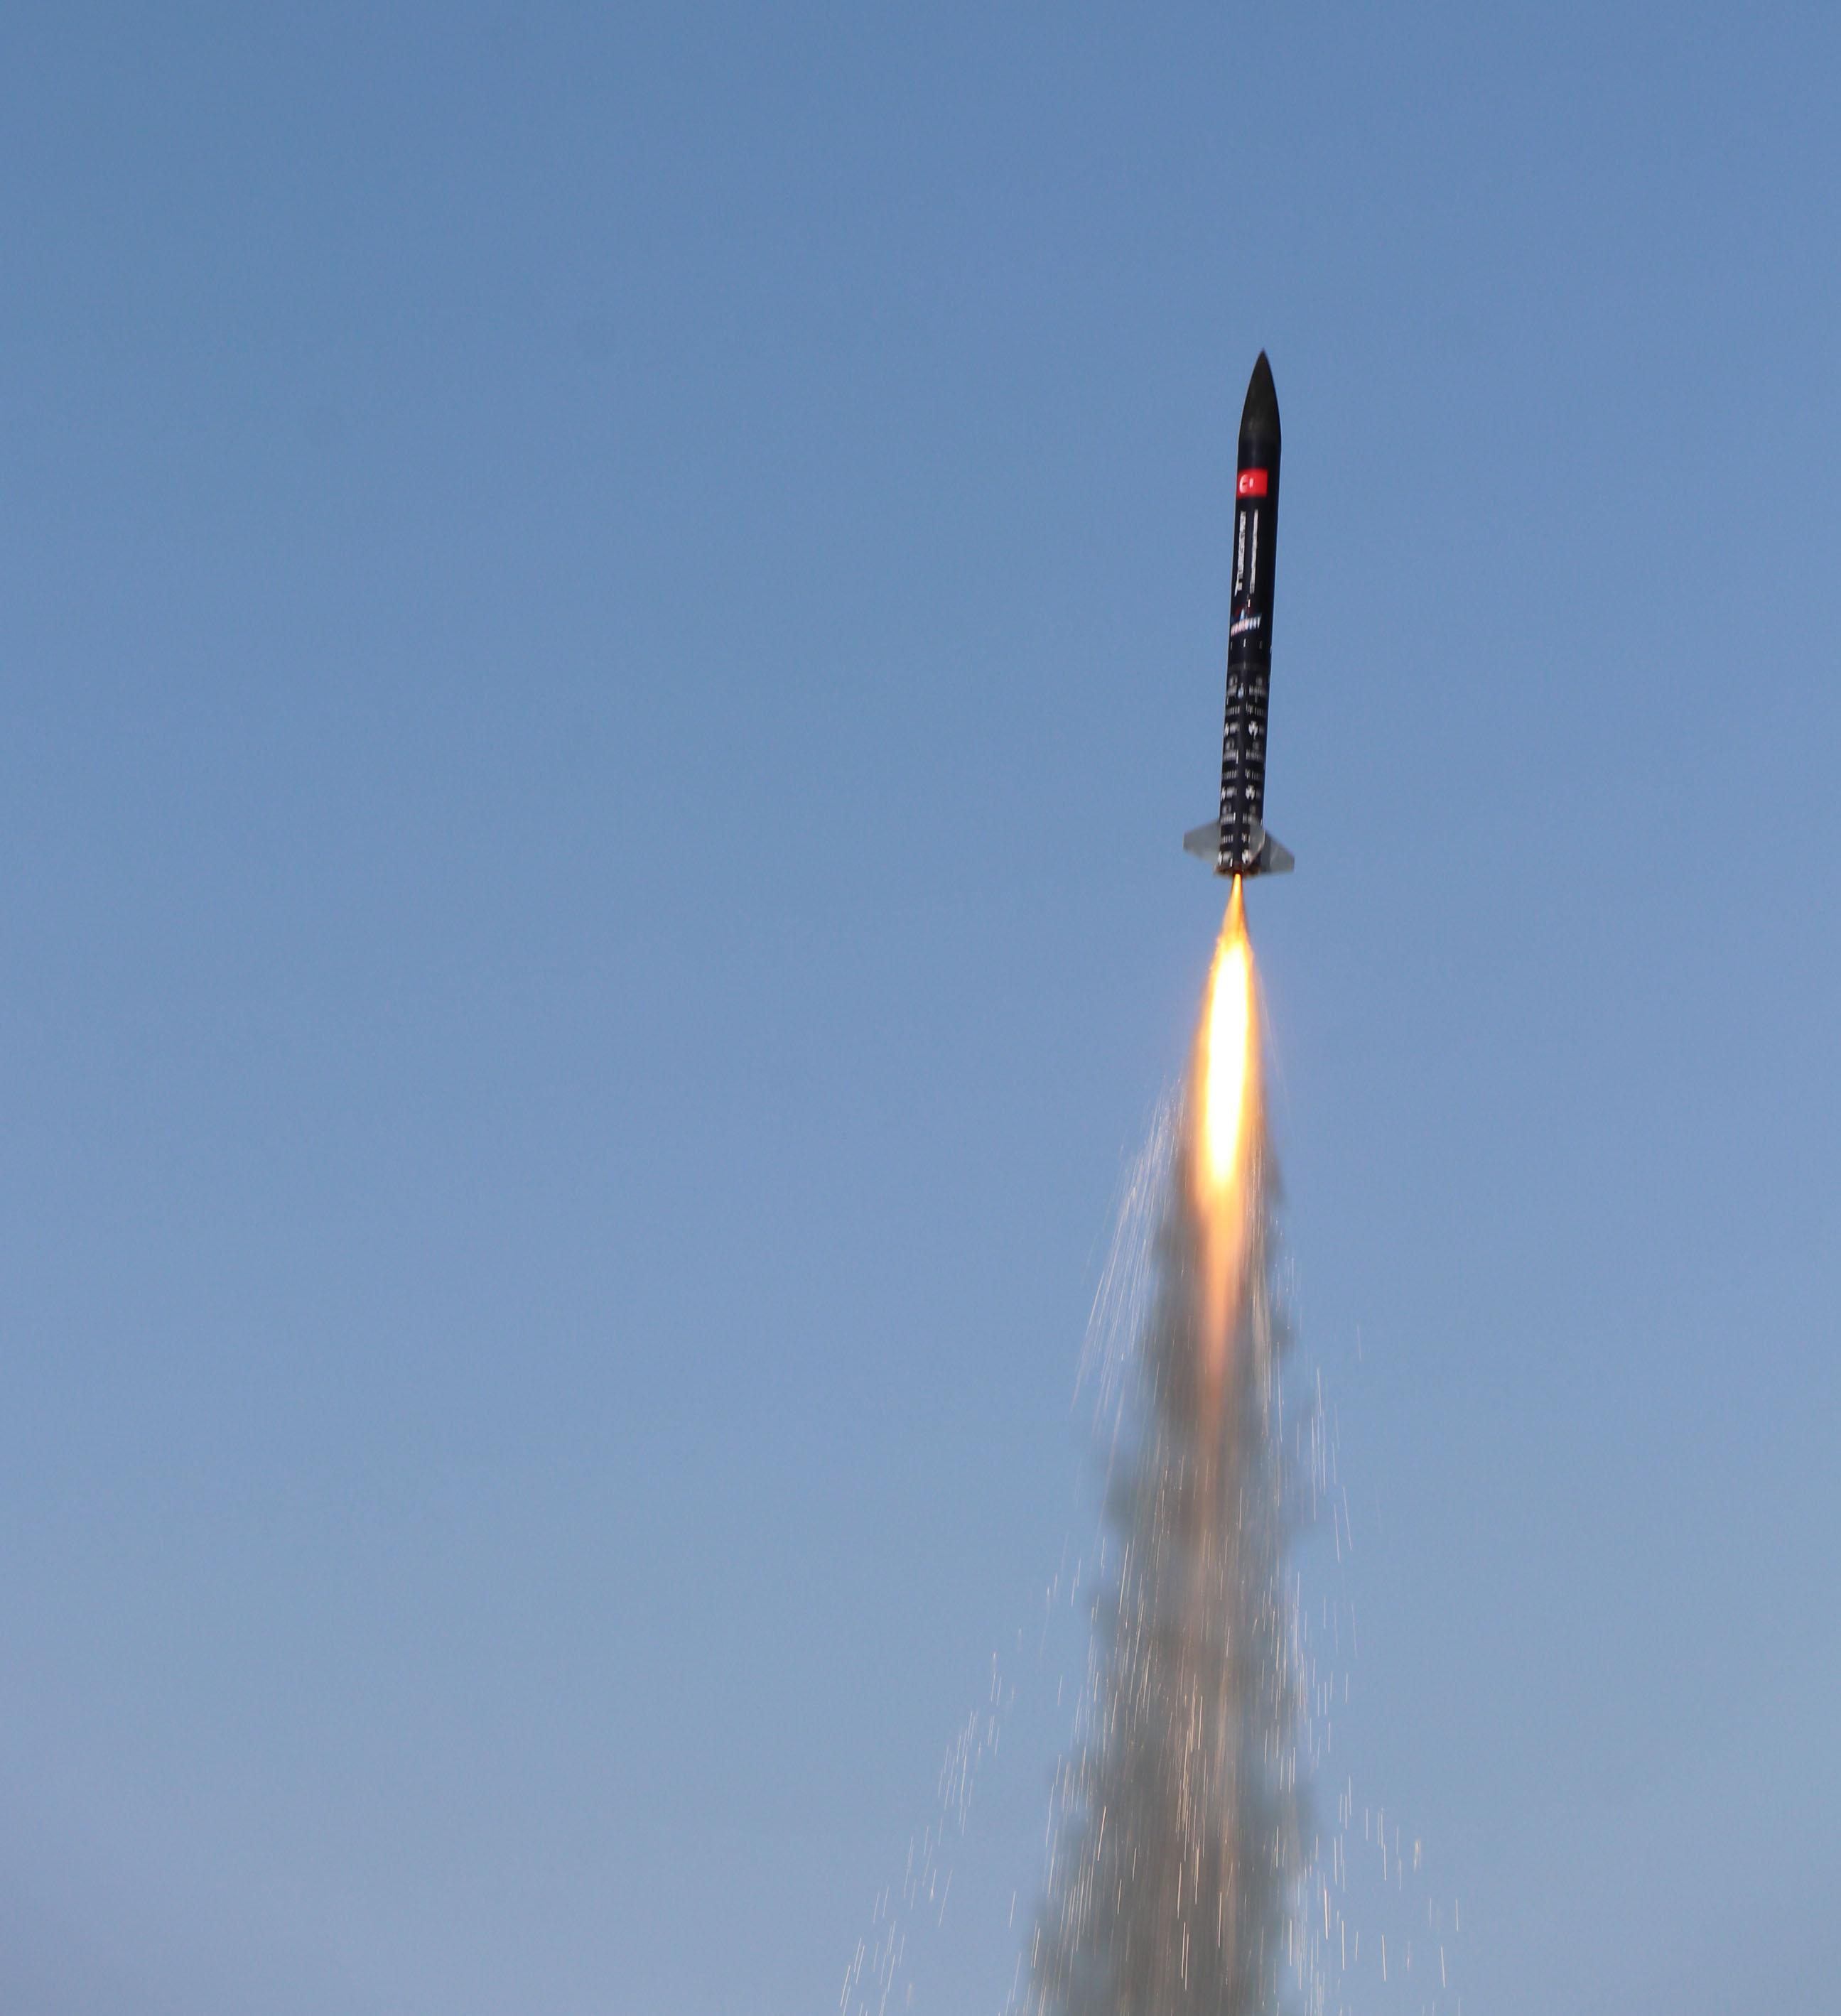 bakan-karaismailoglu-hedefimiz-turksat-5ayi-30-kasimda-uzaya-firlatmak-1819-dhaphoto2.jpg